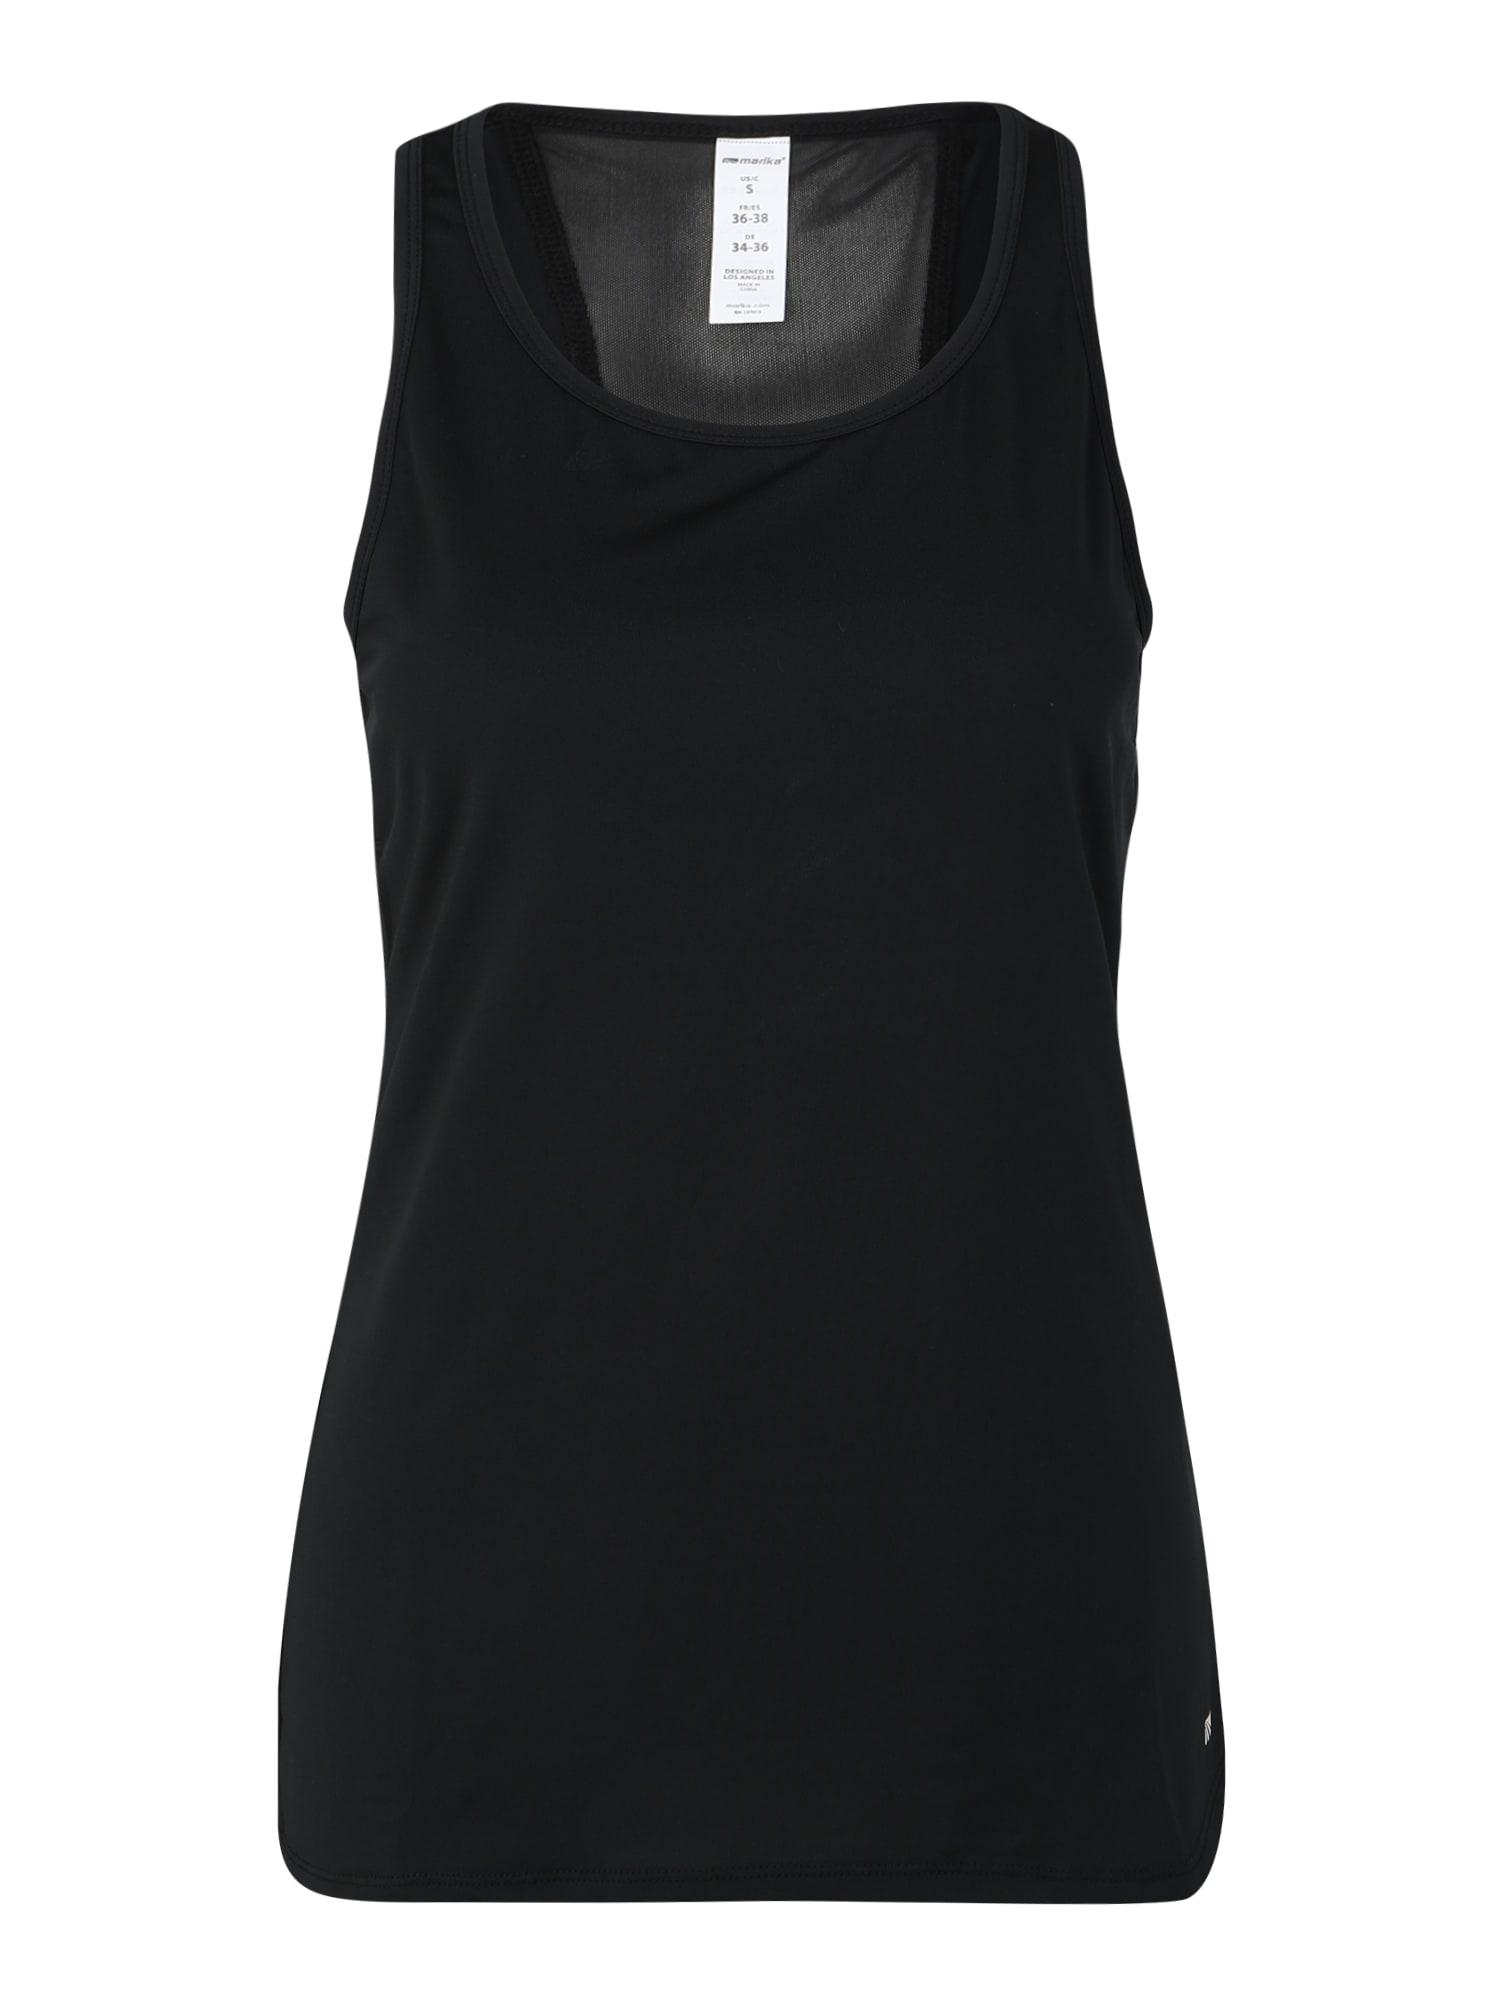 Marika Haut de sport 'BLOSSOM SINGLET'  - Noir - Taille: XL - female